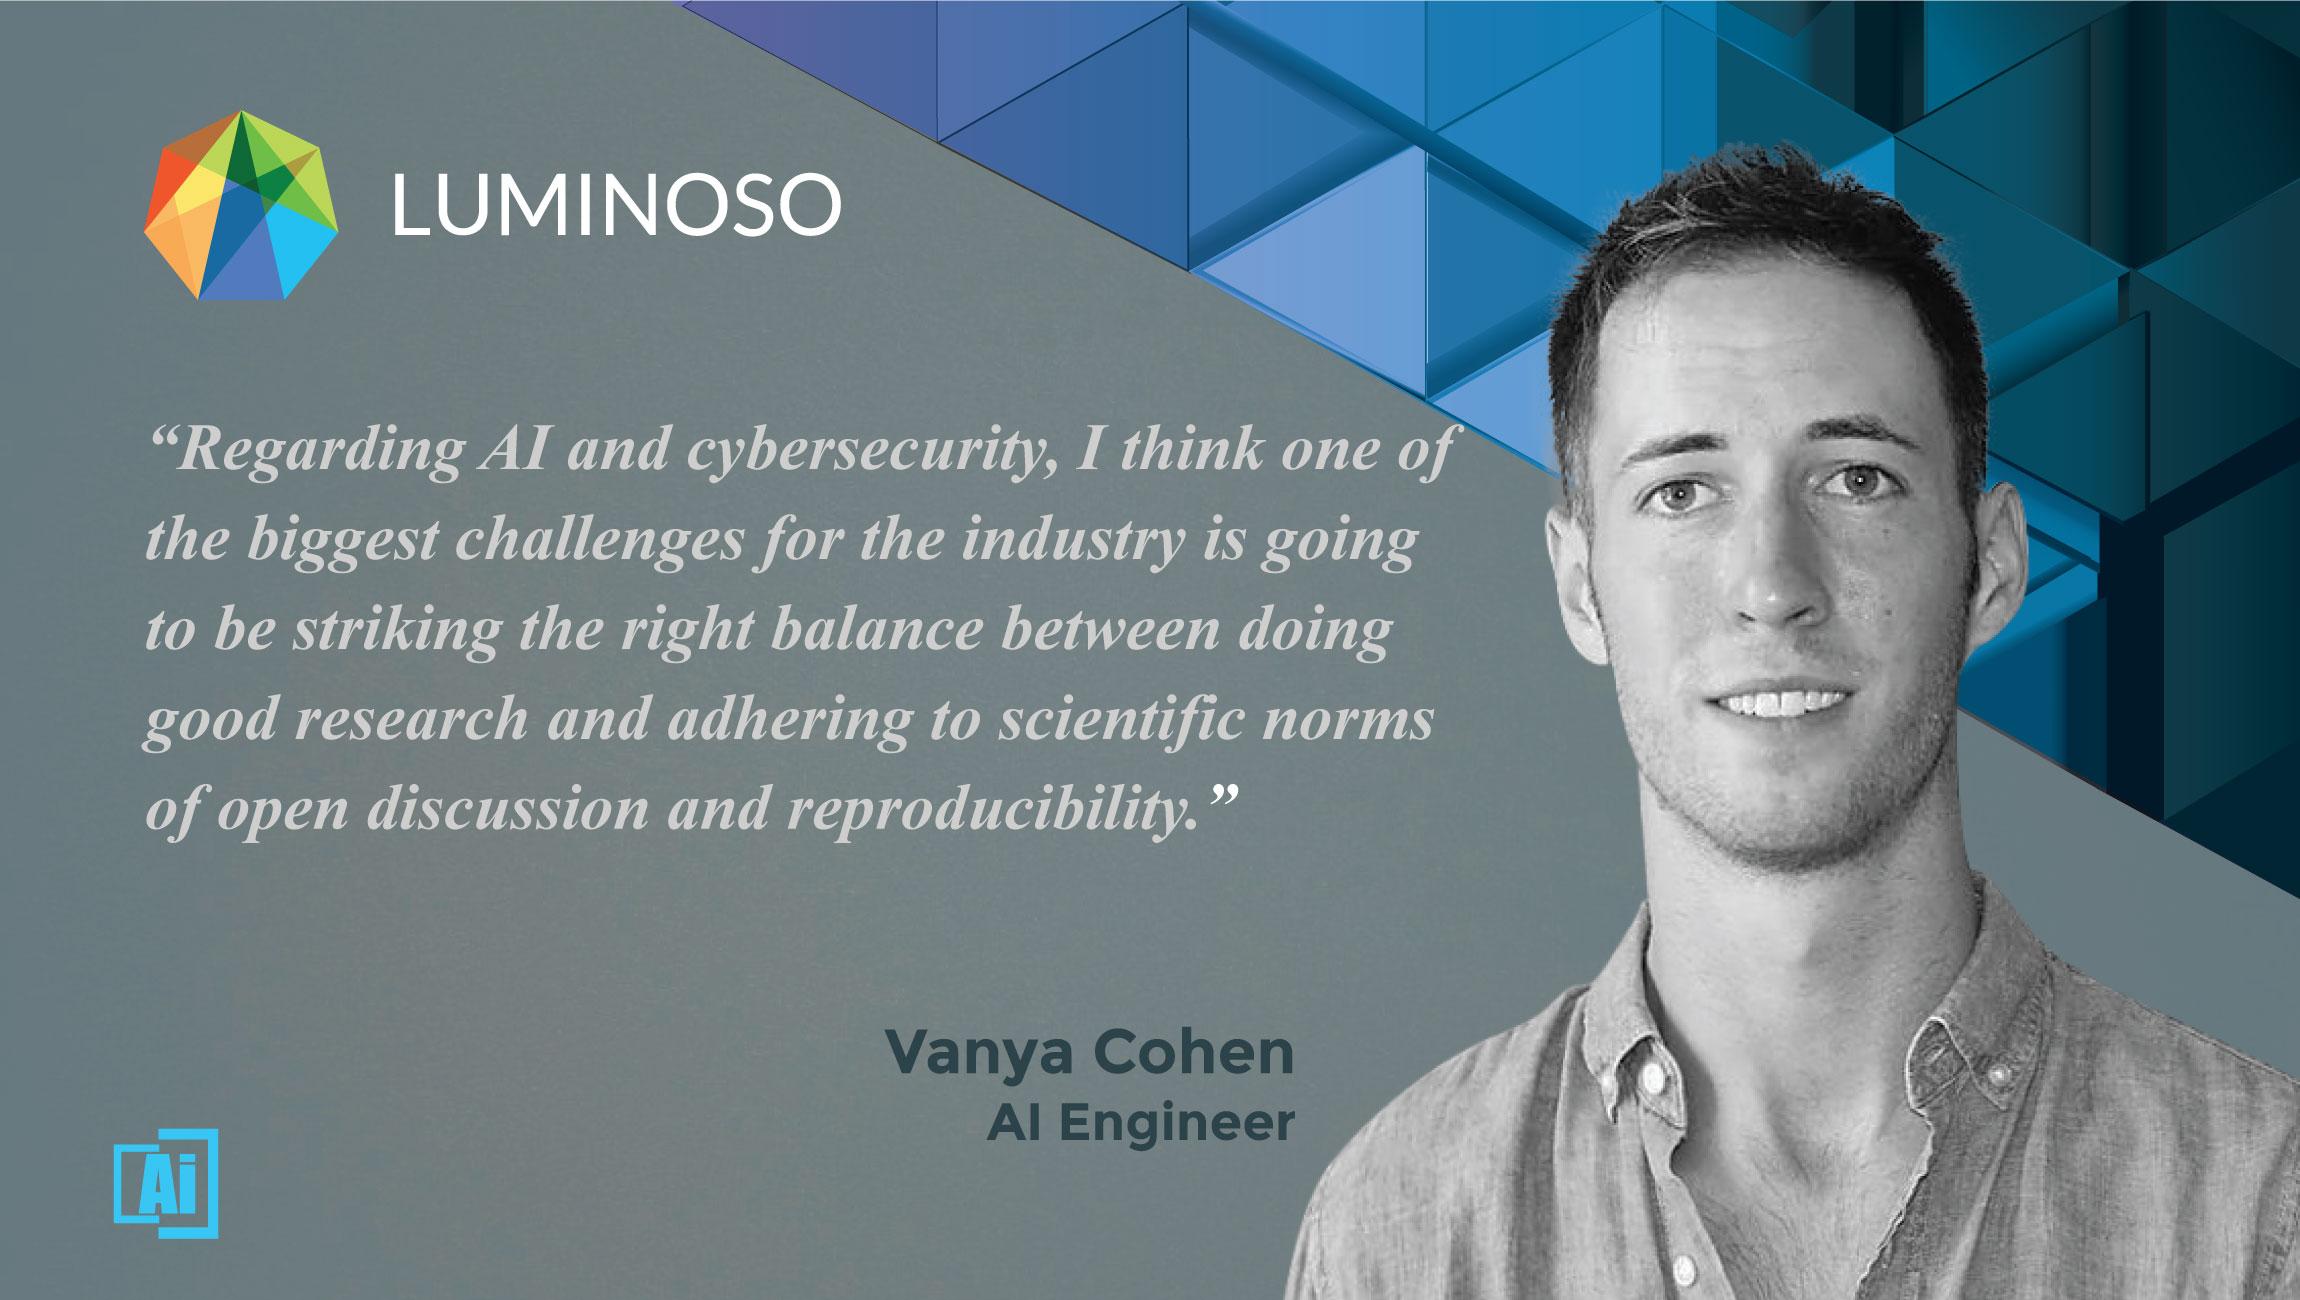 AiThority Interview with Vanya Cohen, Machine Learning Engineer at Luminoso